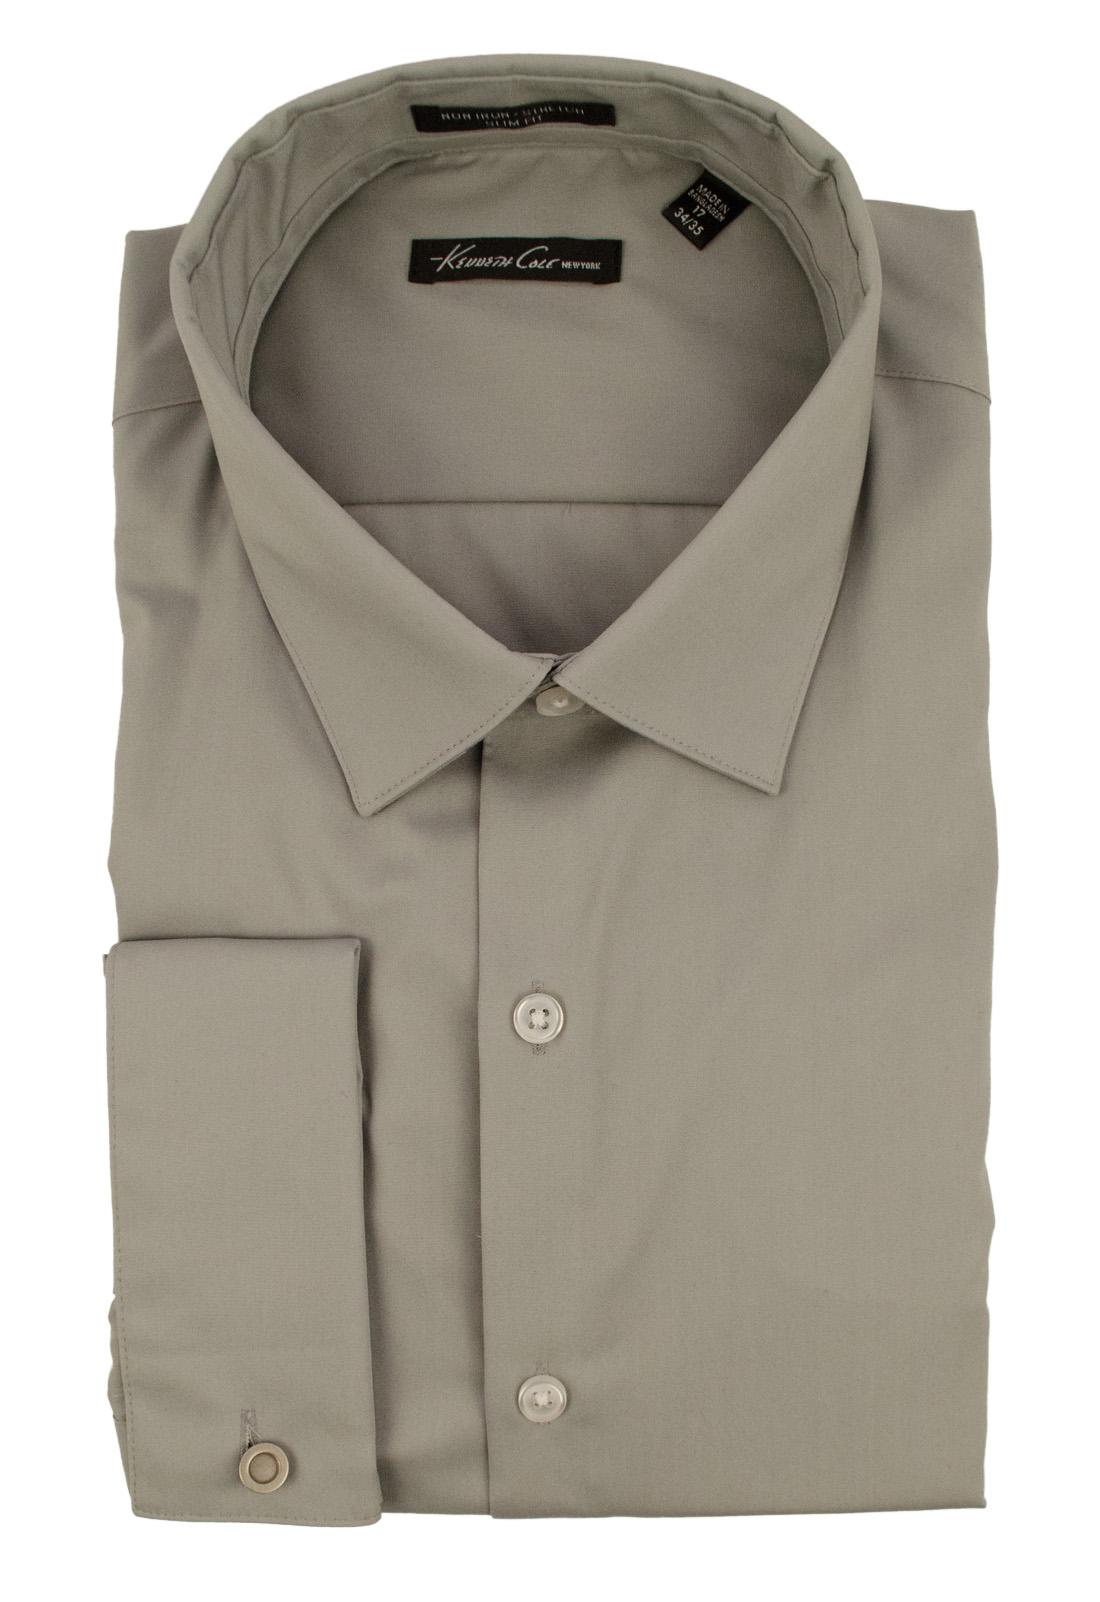 917af174bc Kenneth Cole New York Men's Stretch Slim Fit French Cuff Sleeve Shirt